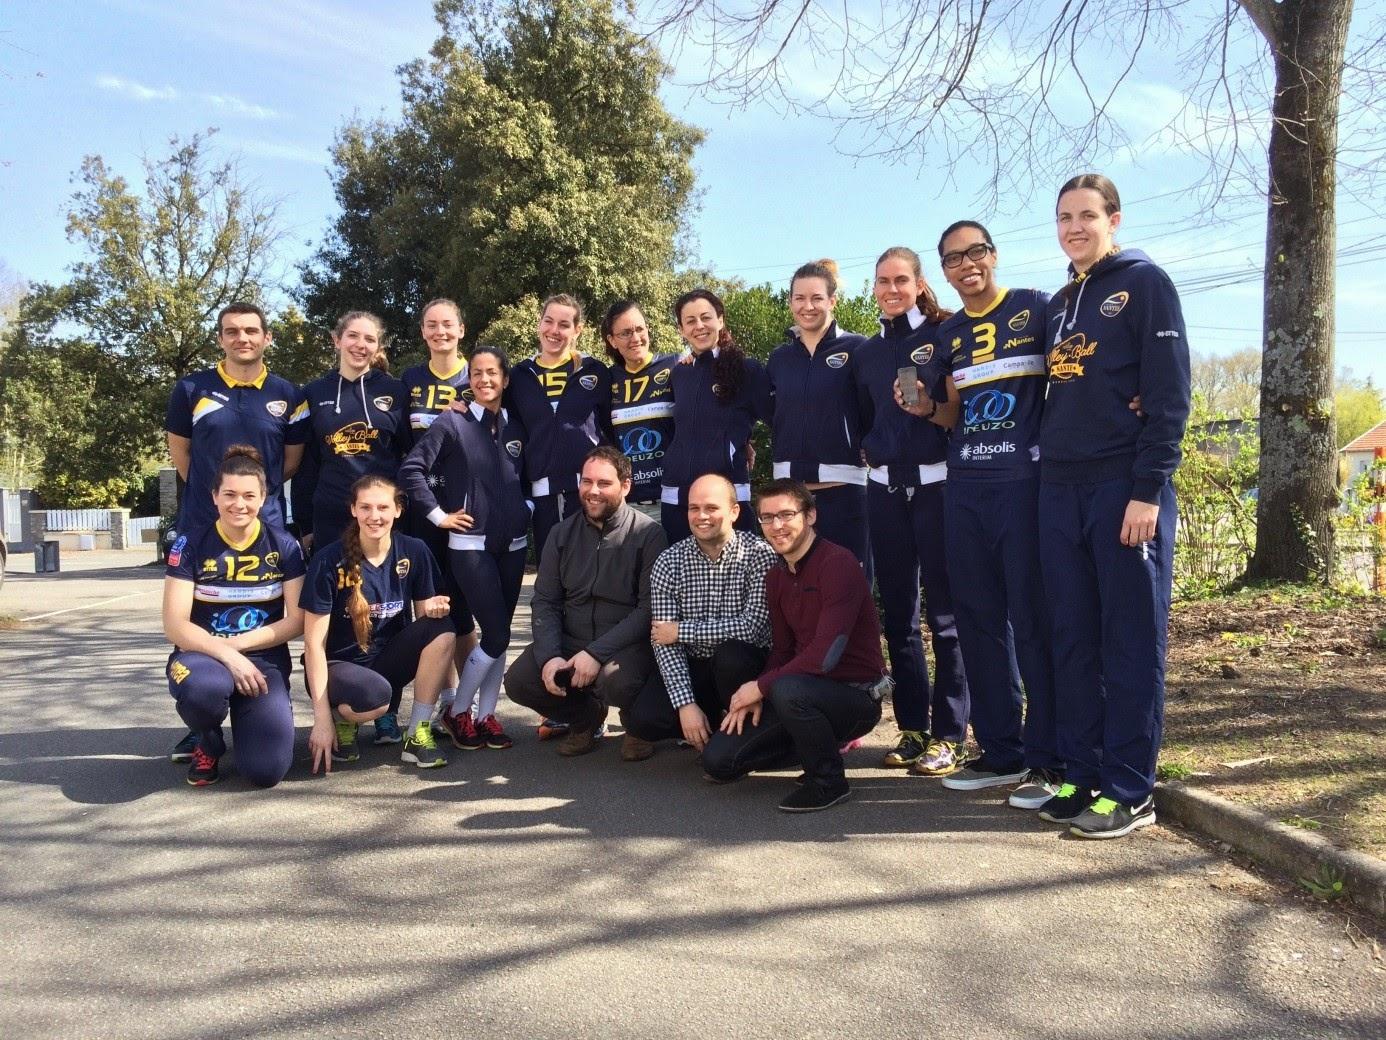 Equipe-feminine-volley-Nantes--Application-mobile--PassionNantes---esn-lille-ssii-grenoble-paris-lyon-nantes-bordeaux-hardis-group